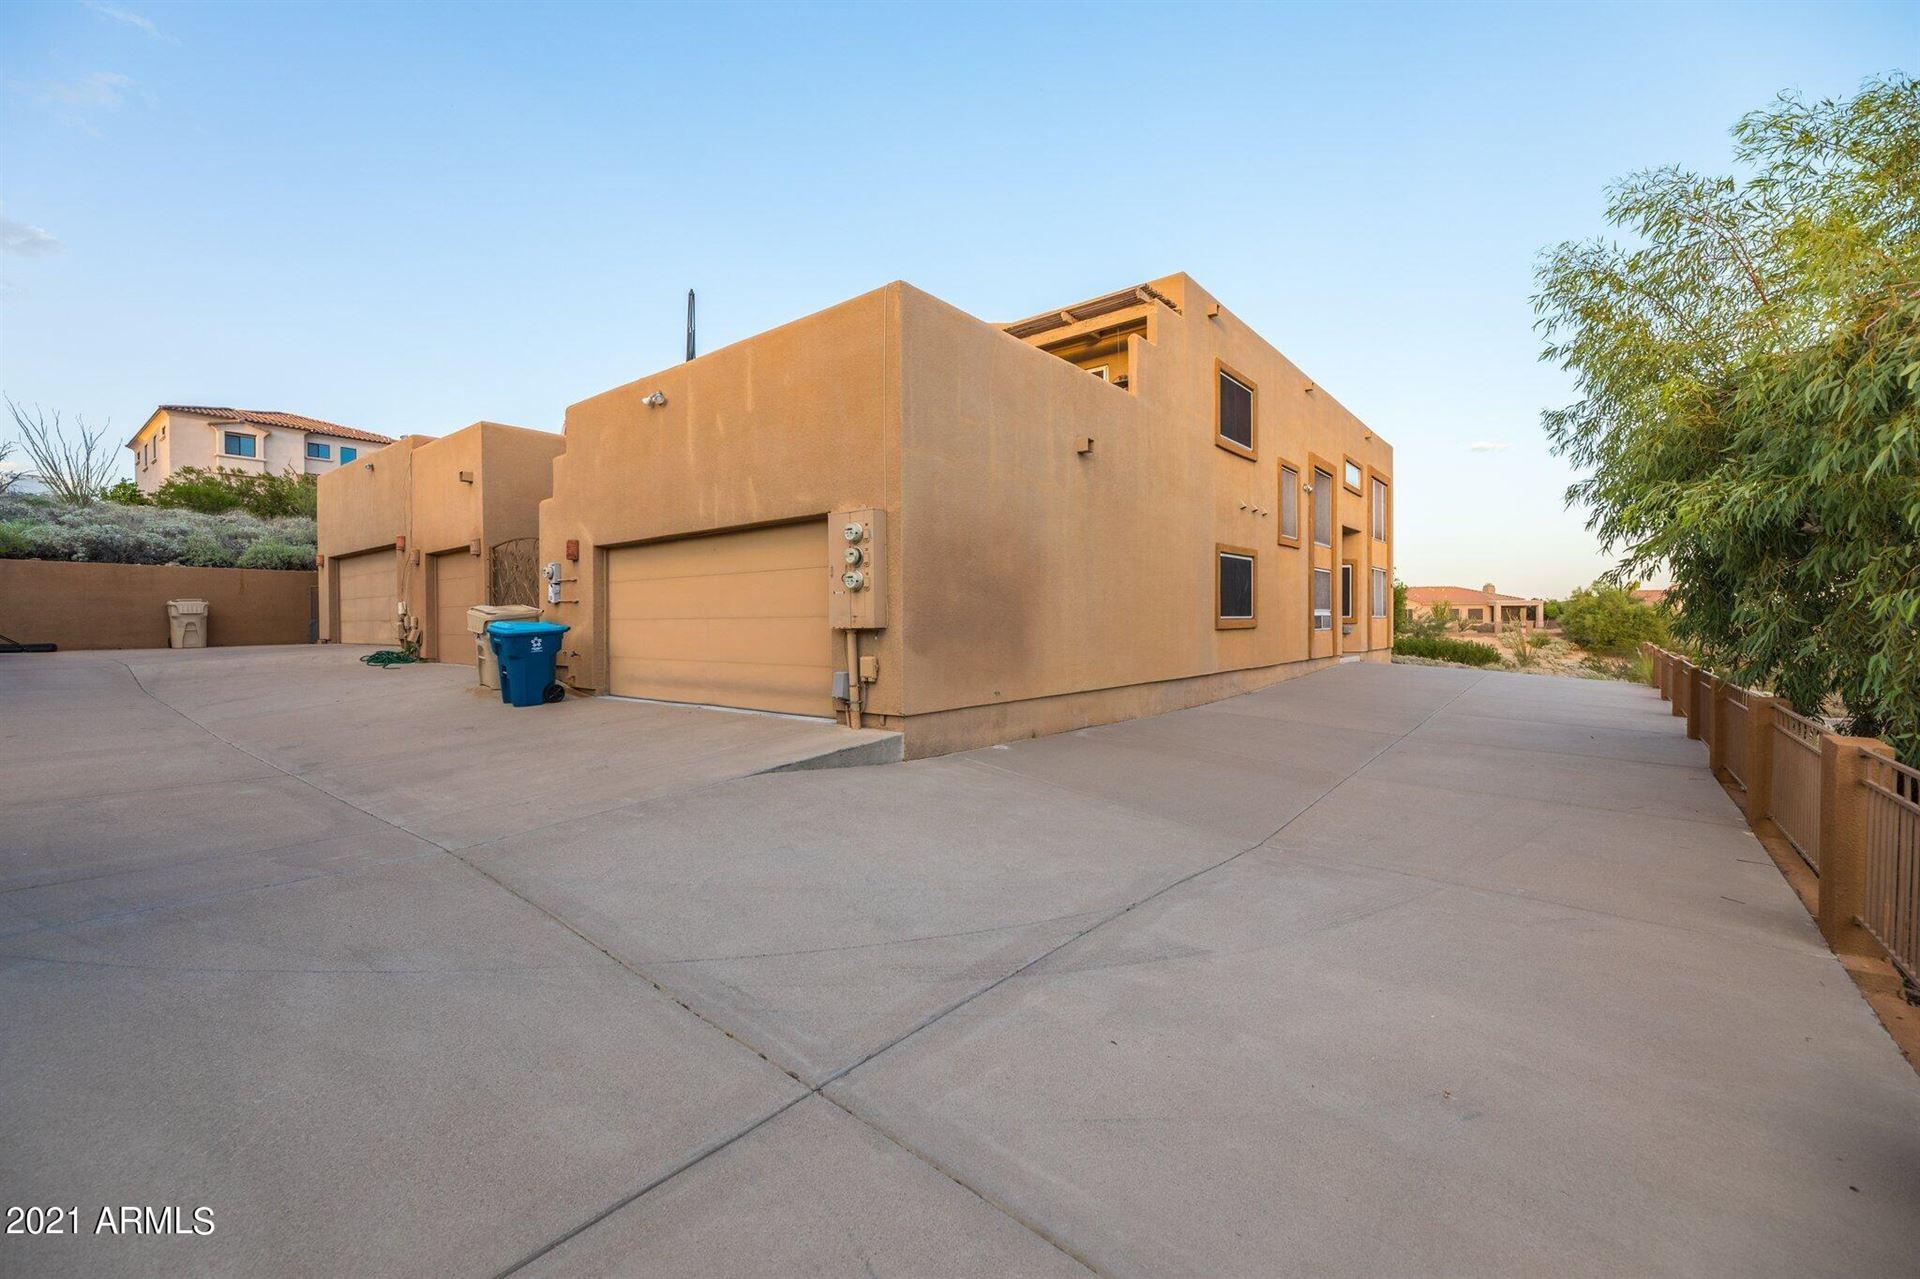 Photo of 13022 N MOUNTAINSIDE Drive #2, Fountain Hills, AZ 85268 (MLS # 6307635)